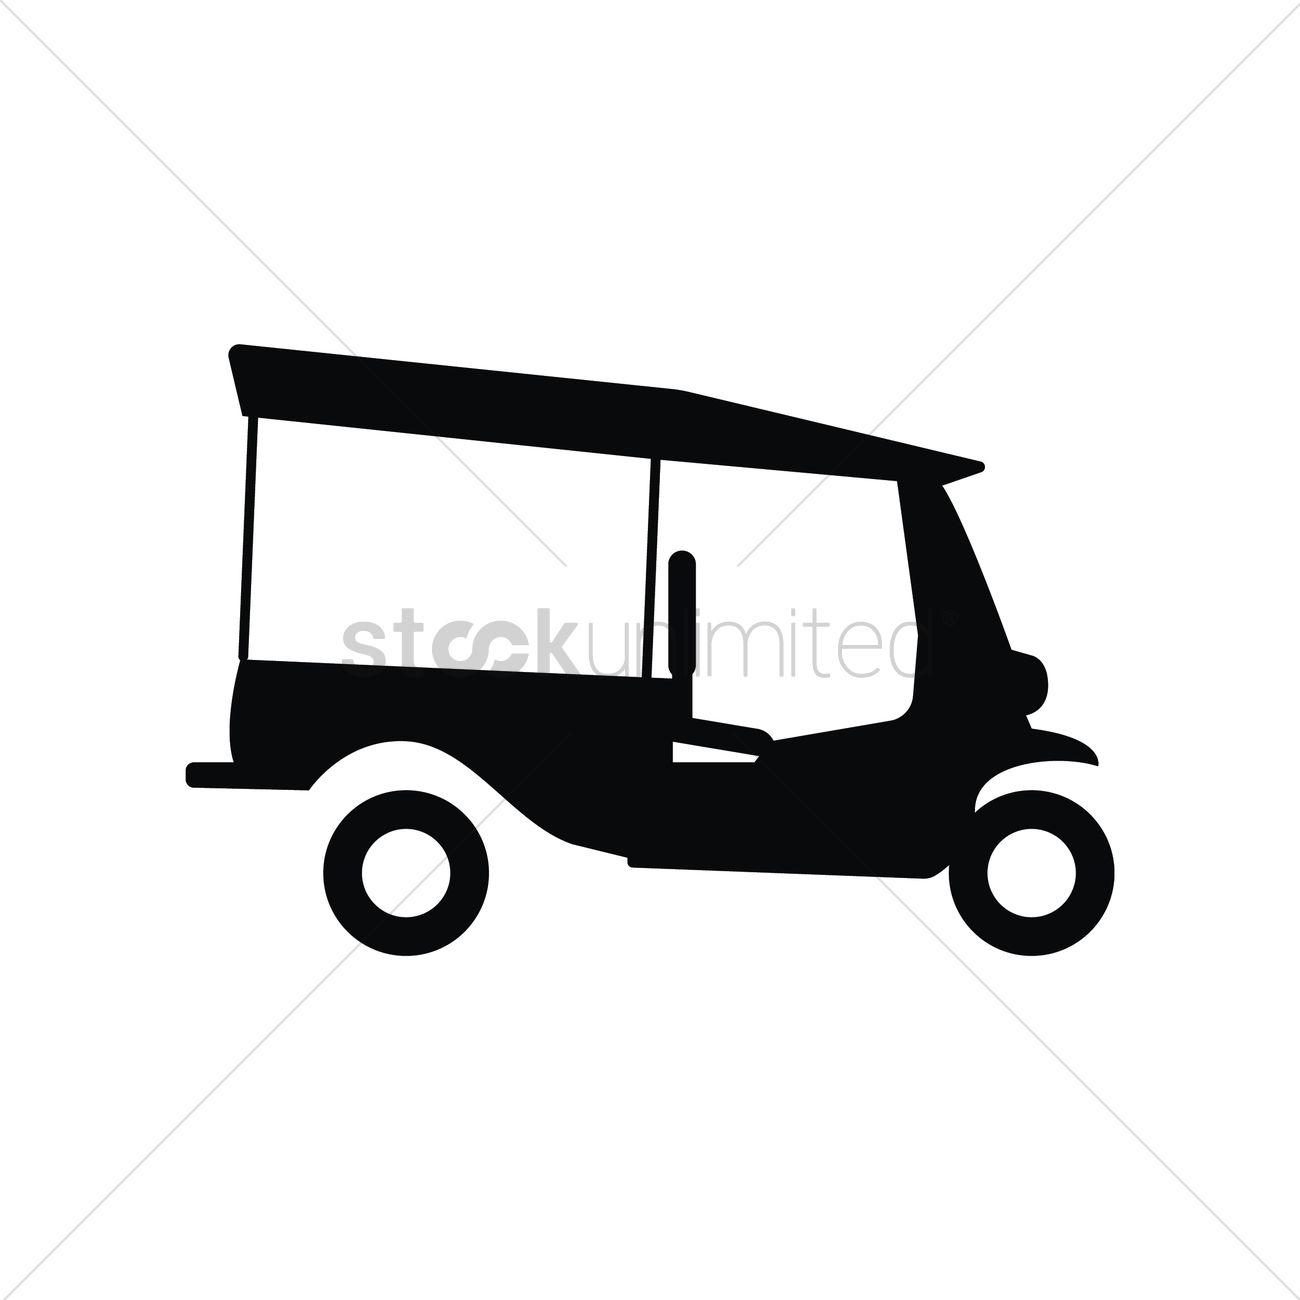 Auto Rickshaw Vector Image